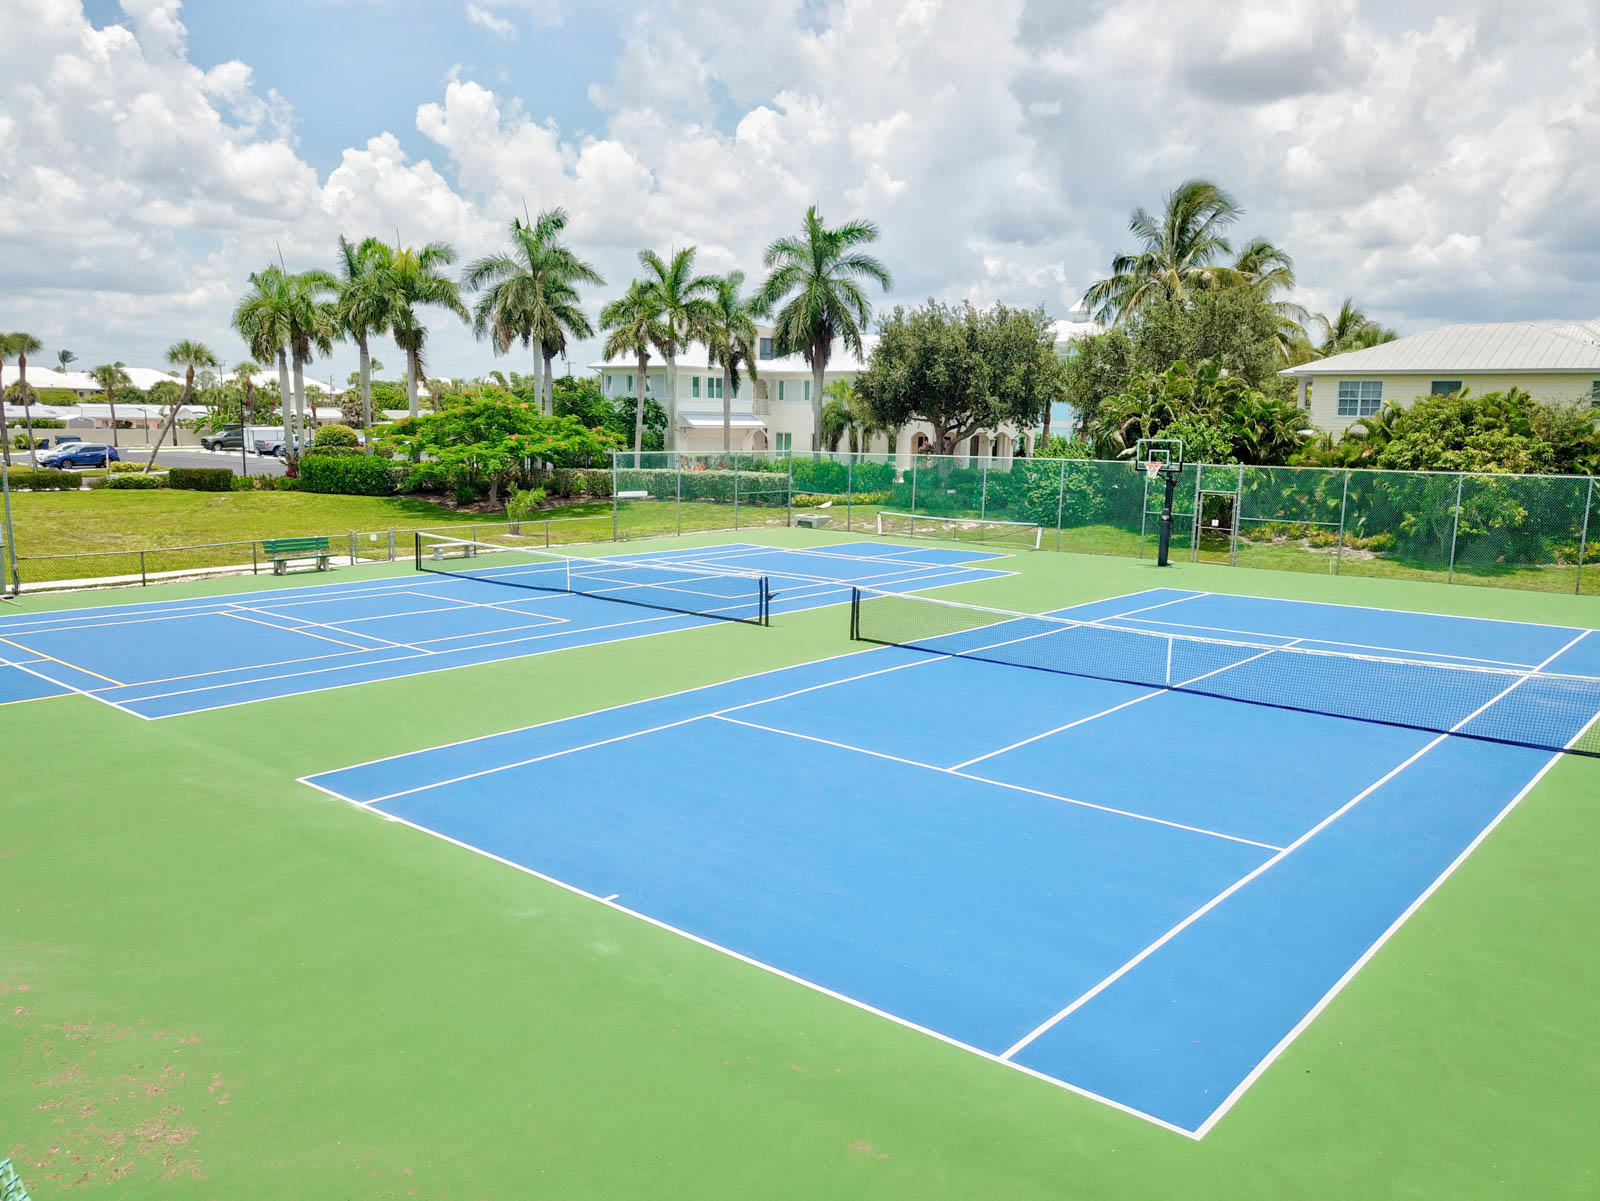 044 - Tennis - Four Winds